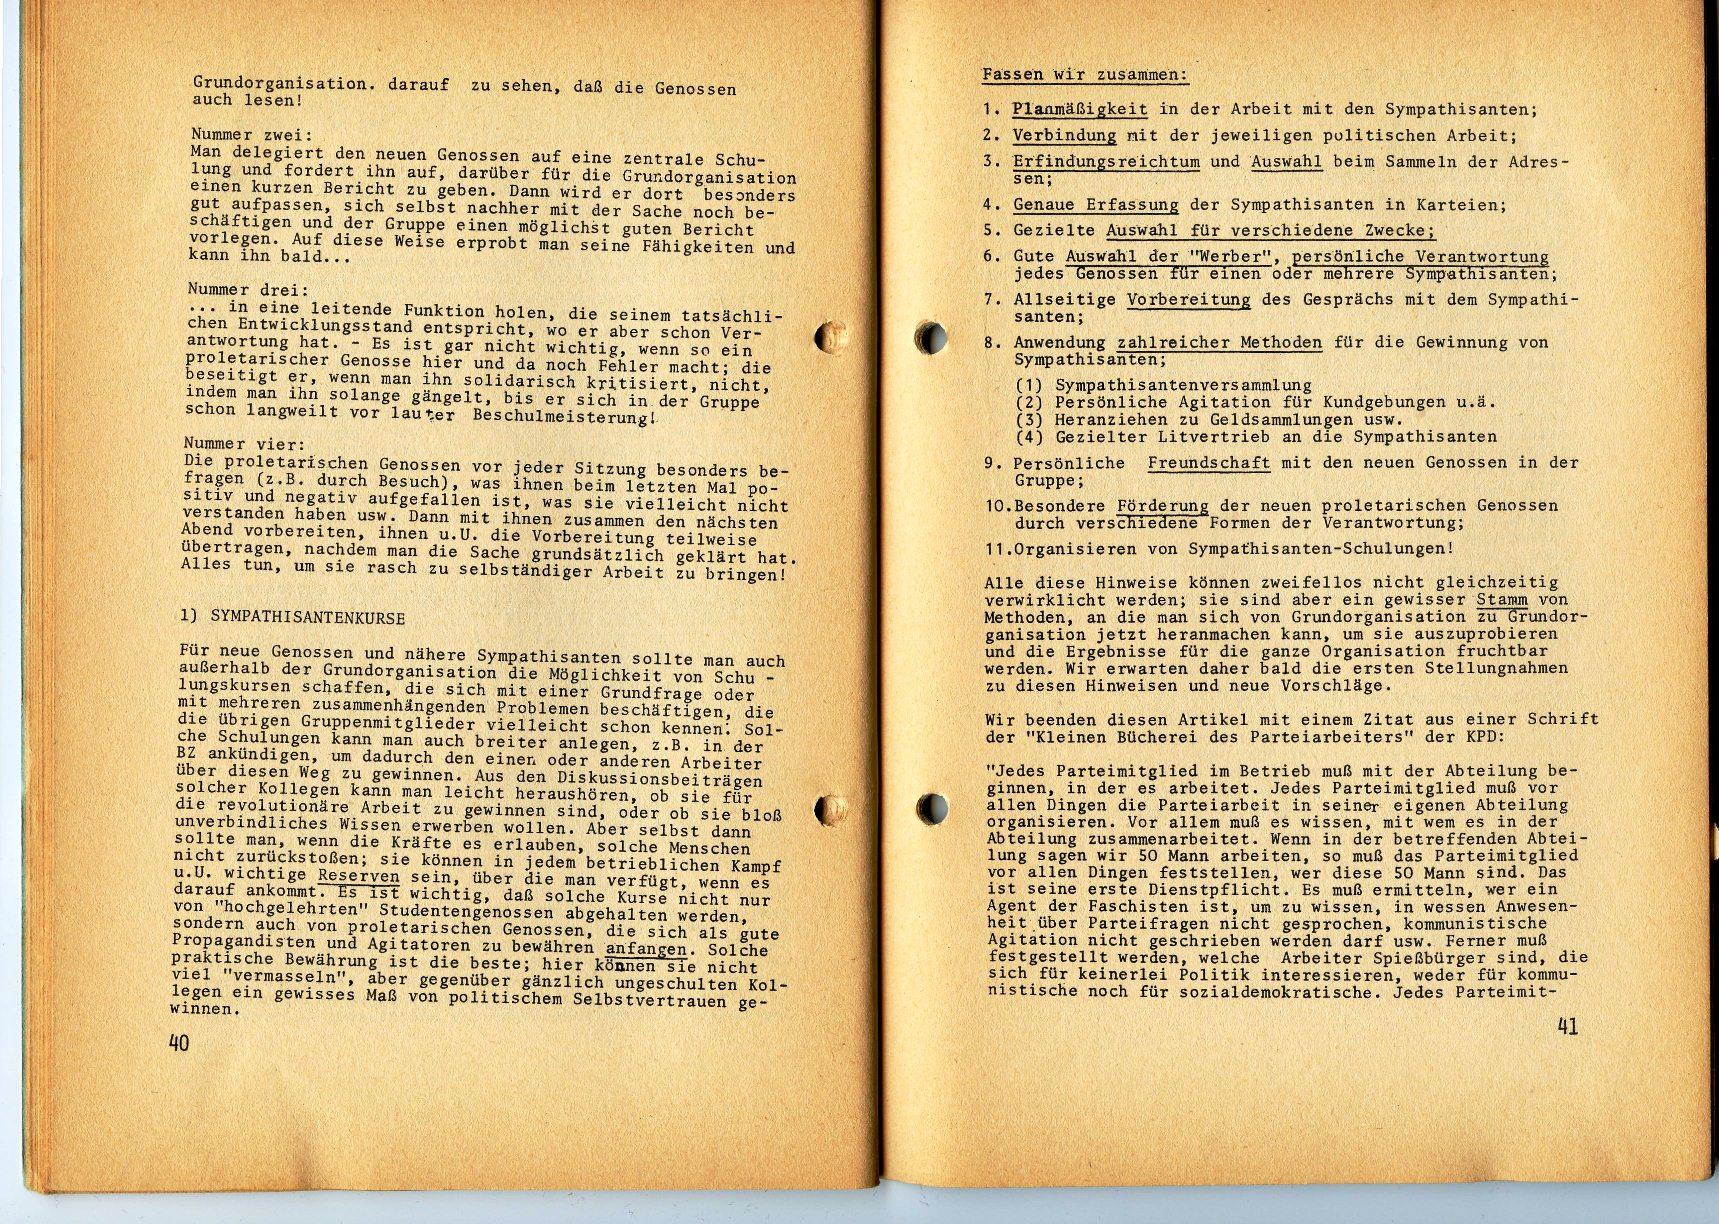 ZB_Parteiarbeiter_1971_04_21